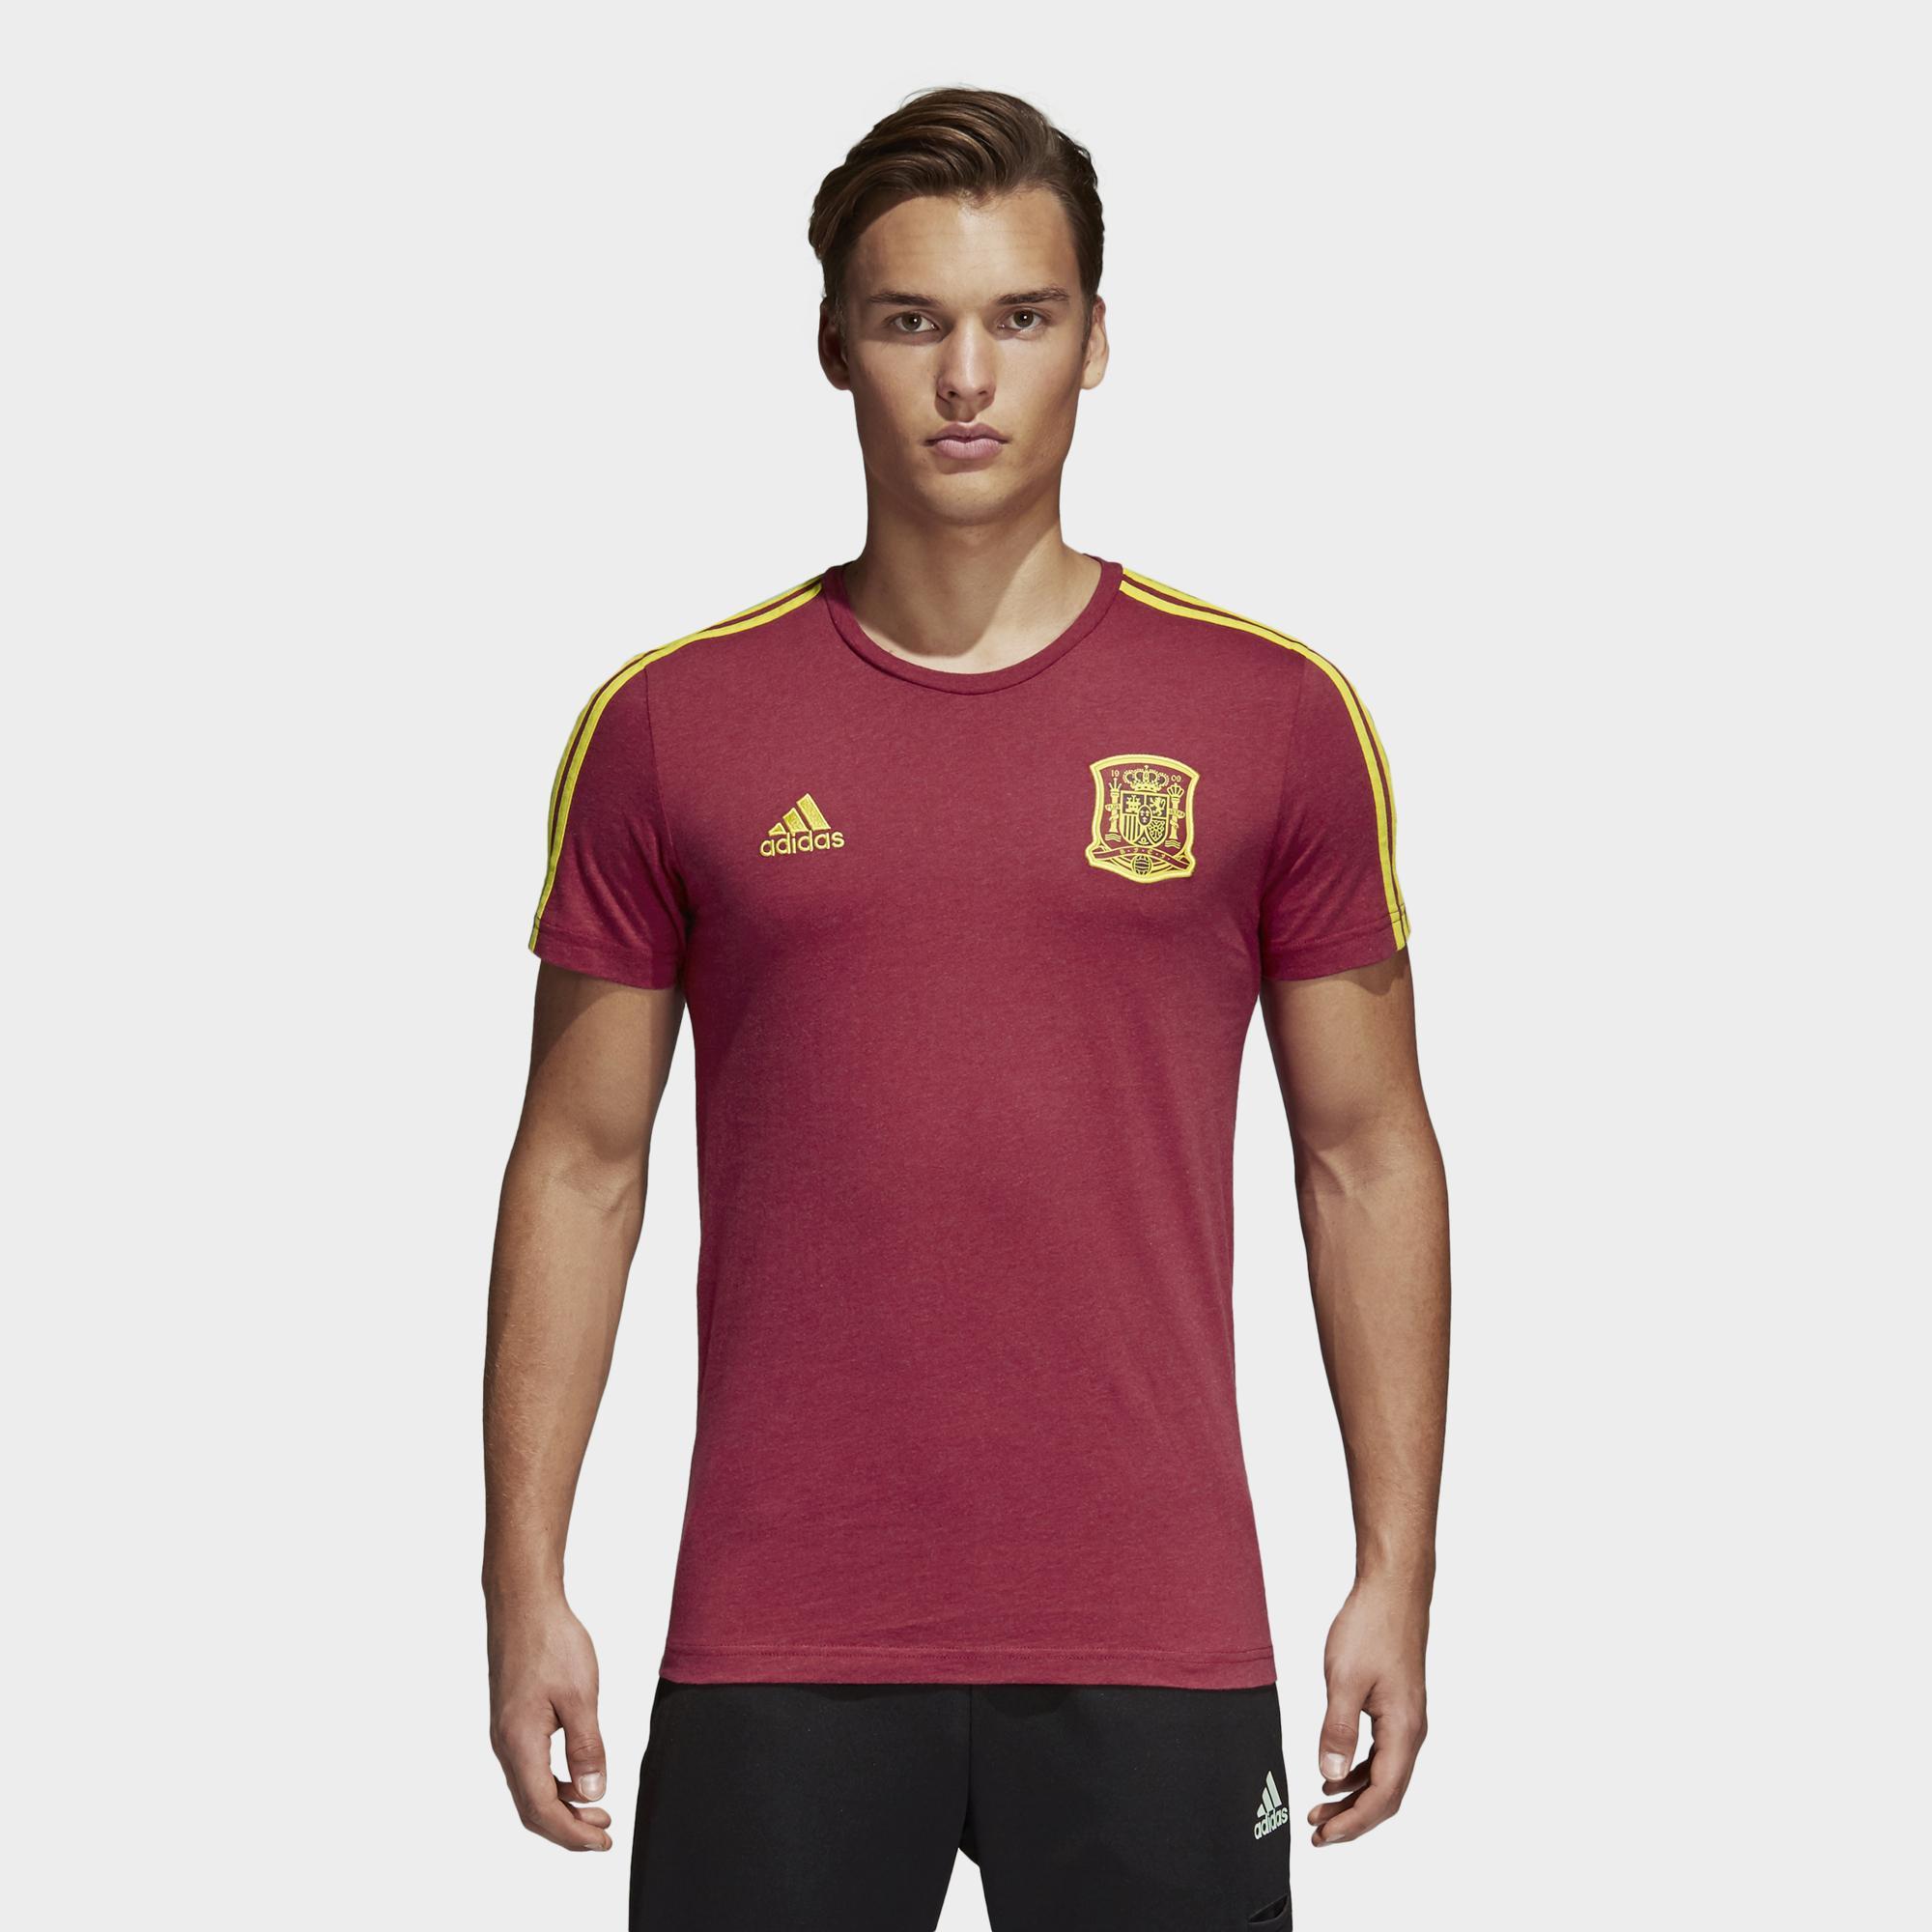 Adidas T-shirt  Spagna